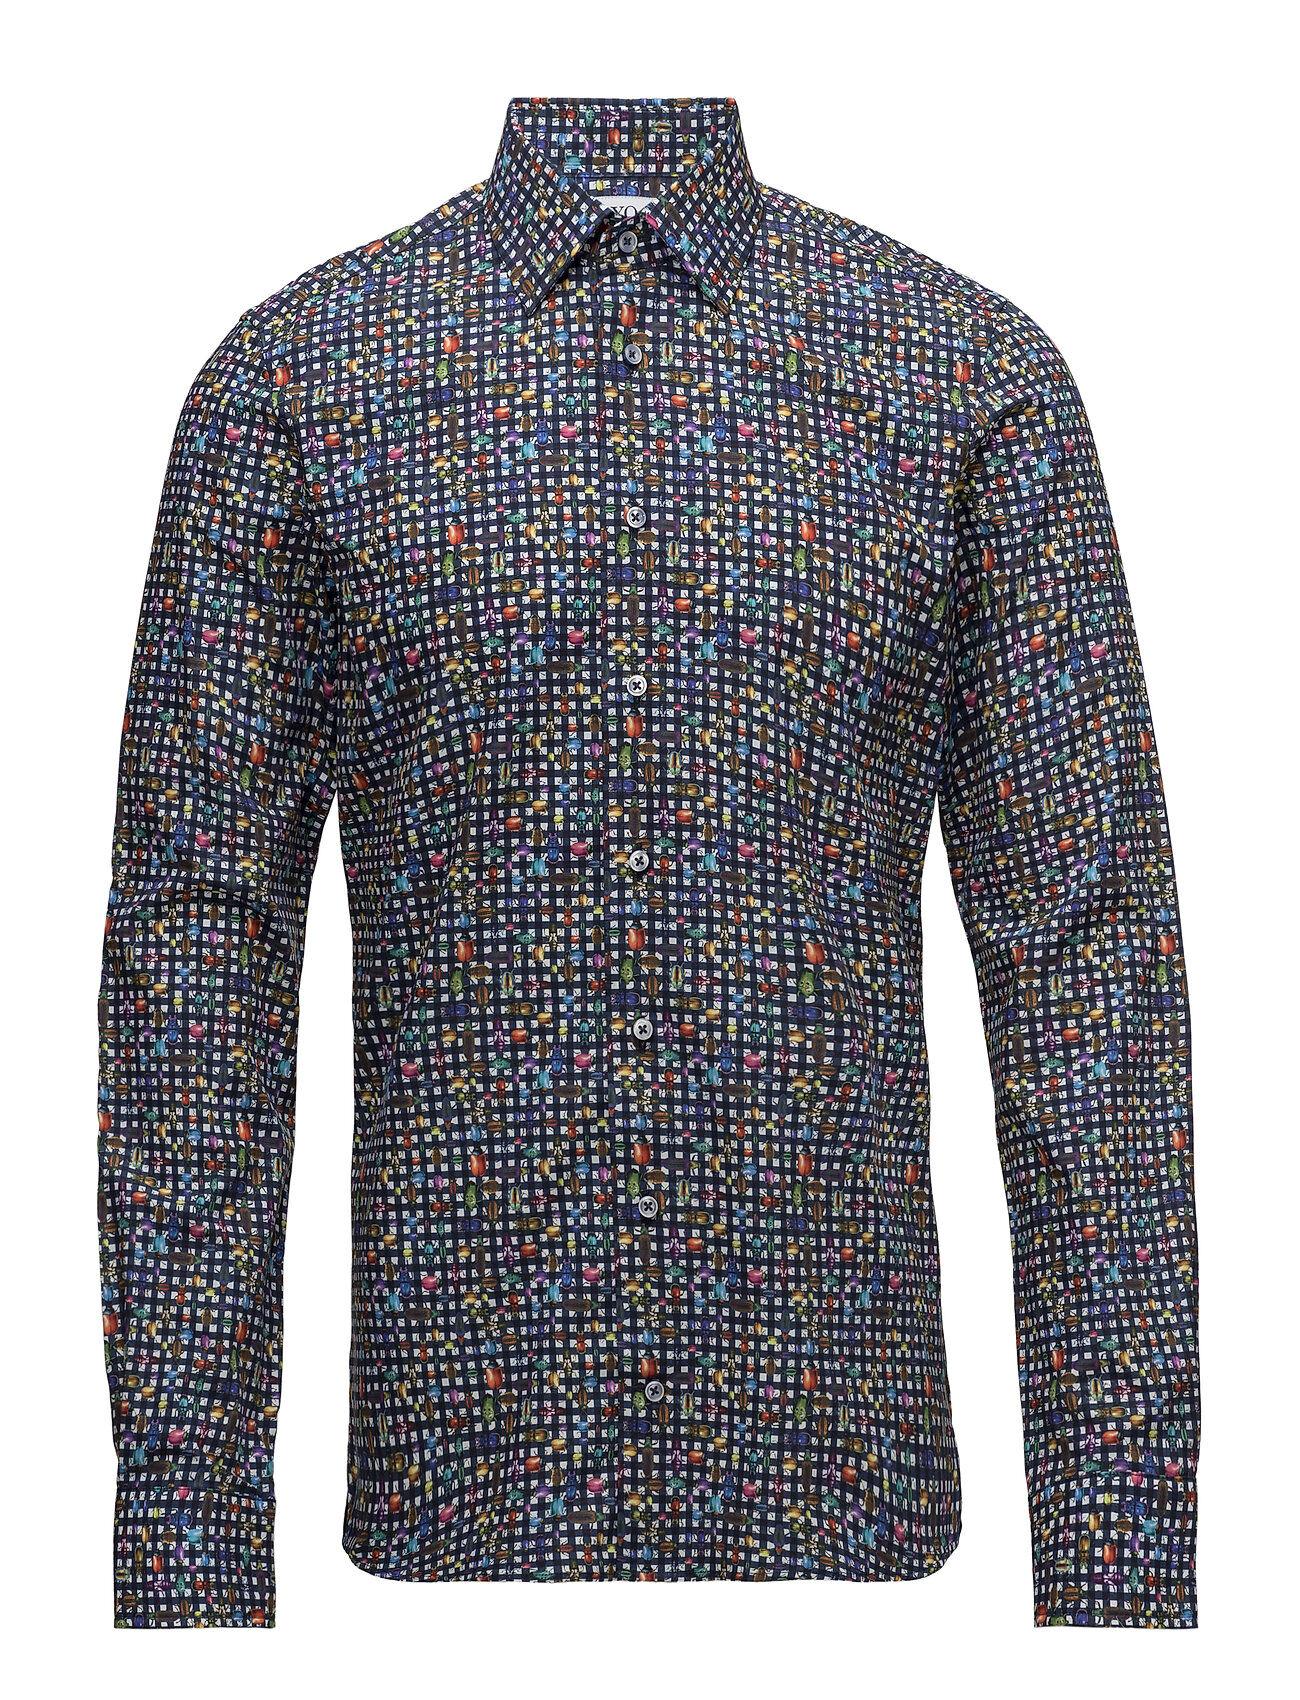 XO Shirtmaker by Sand Copenhagen 8066 - Jake Sc